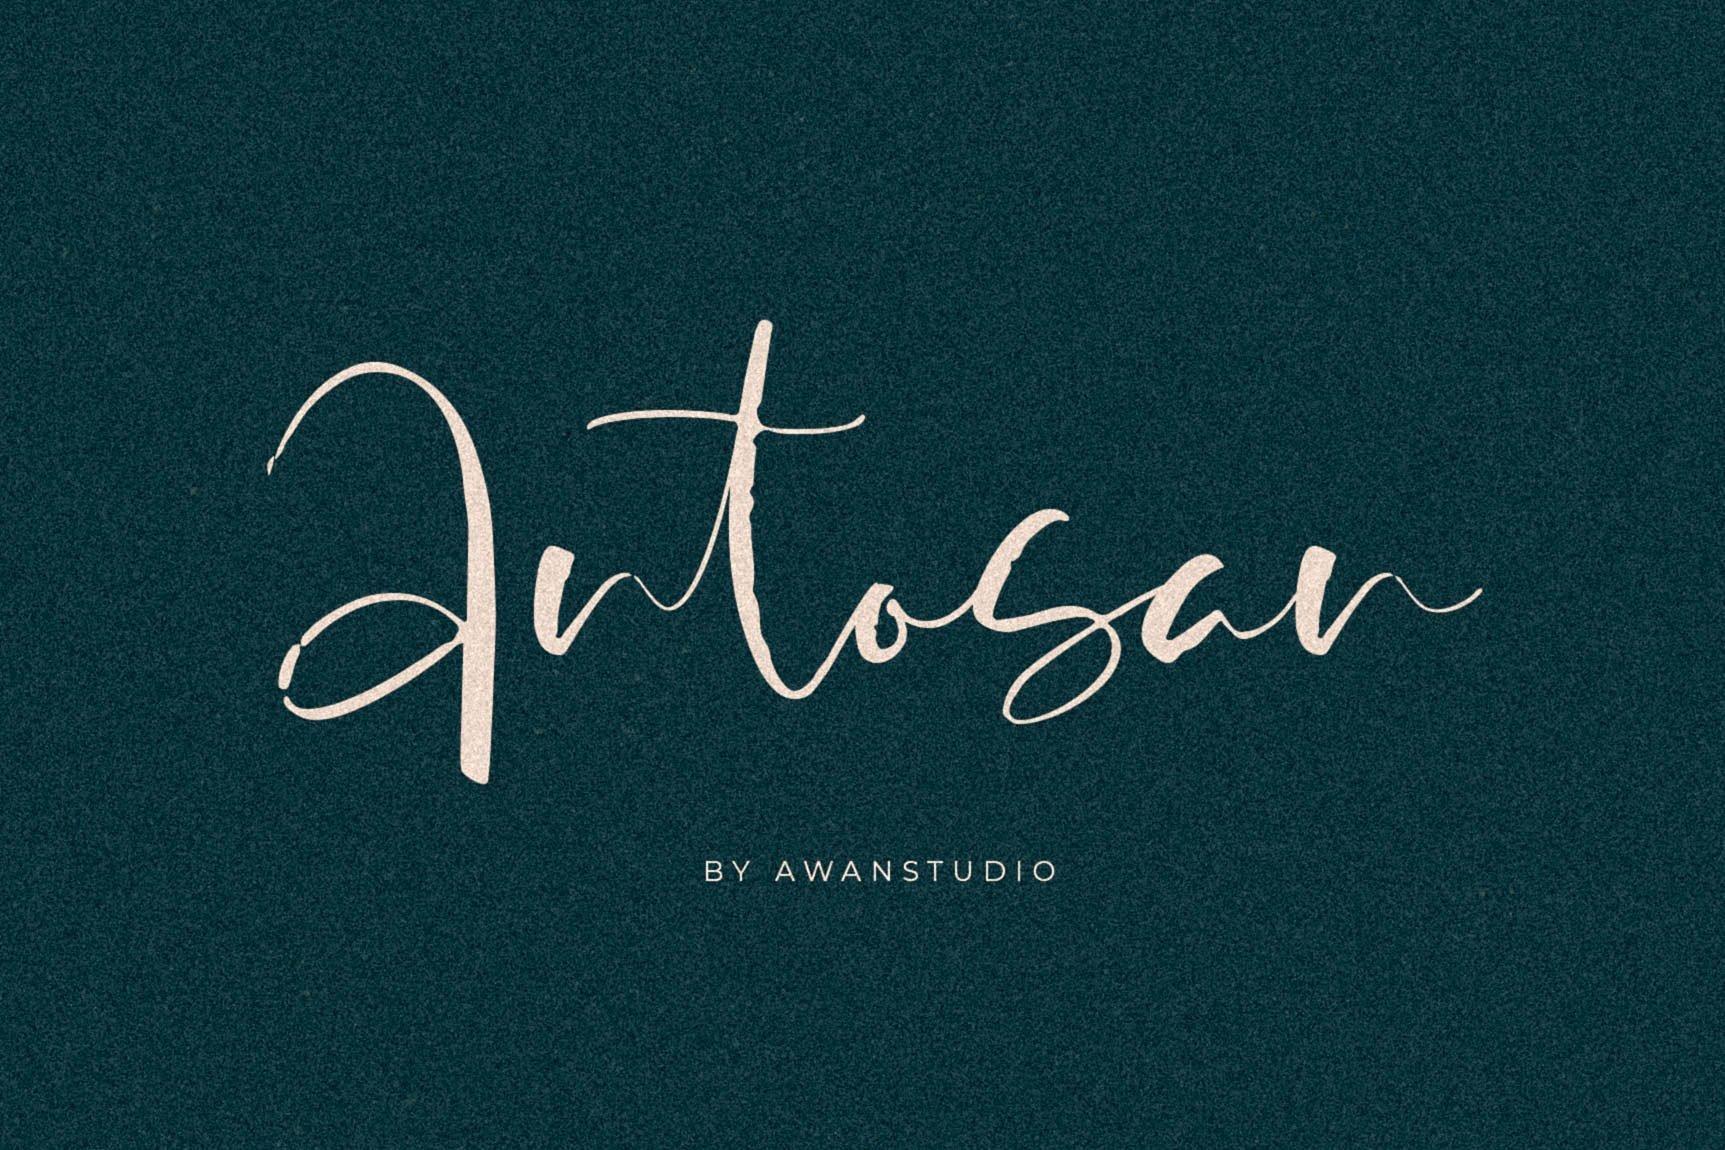 antosan-script-demo_awan-studio_140119_prev01